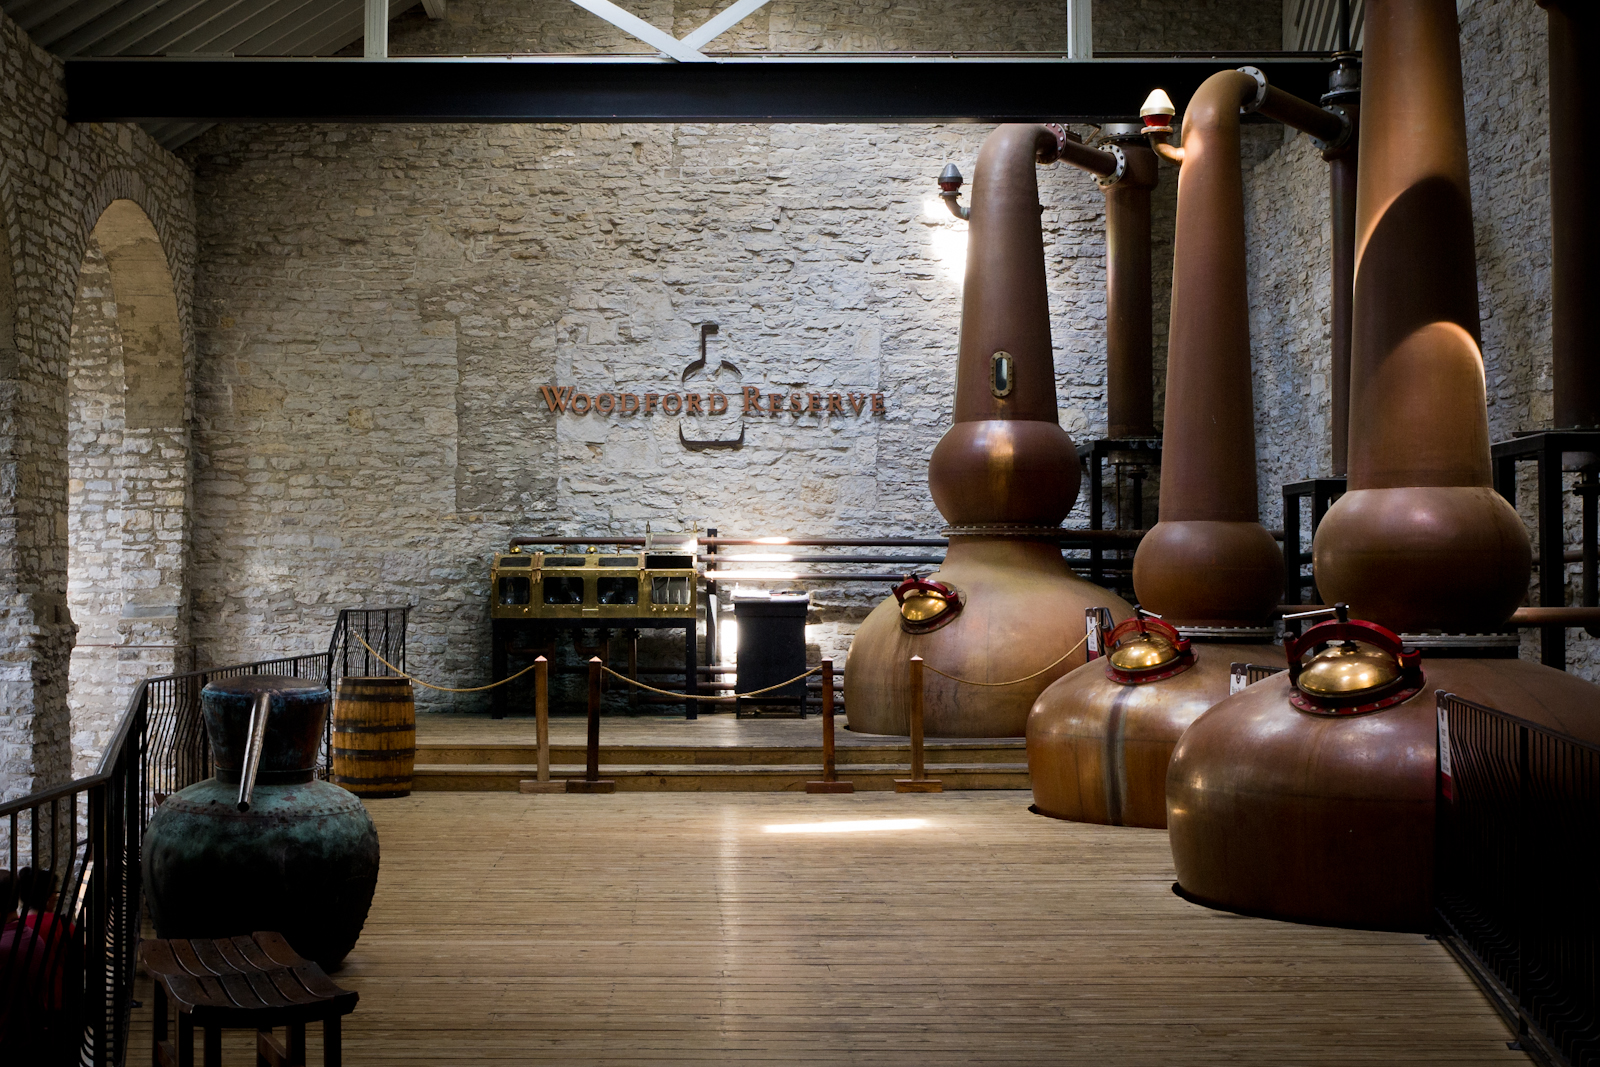 Woodford_Reserve_Distillery-27527-3.jpg